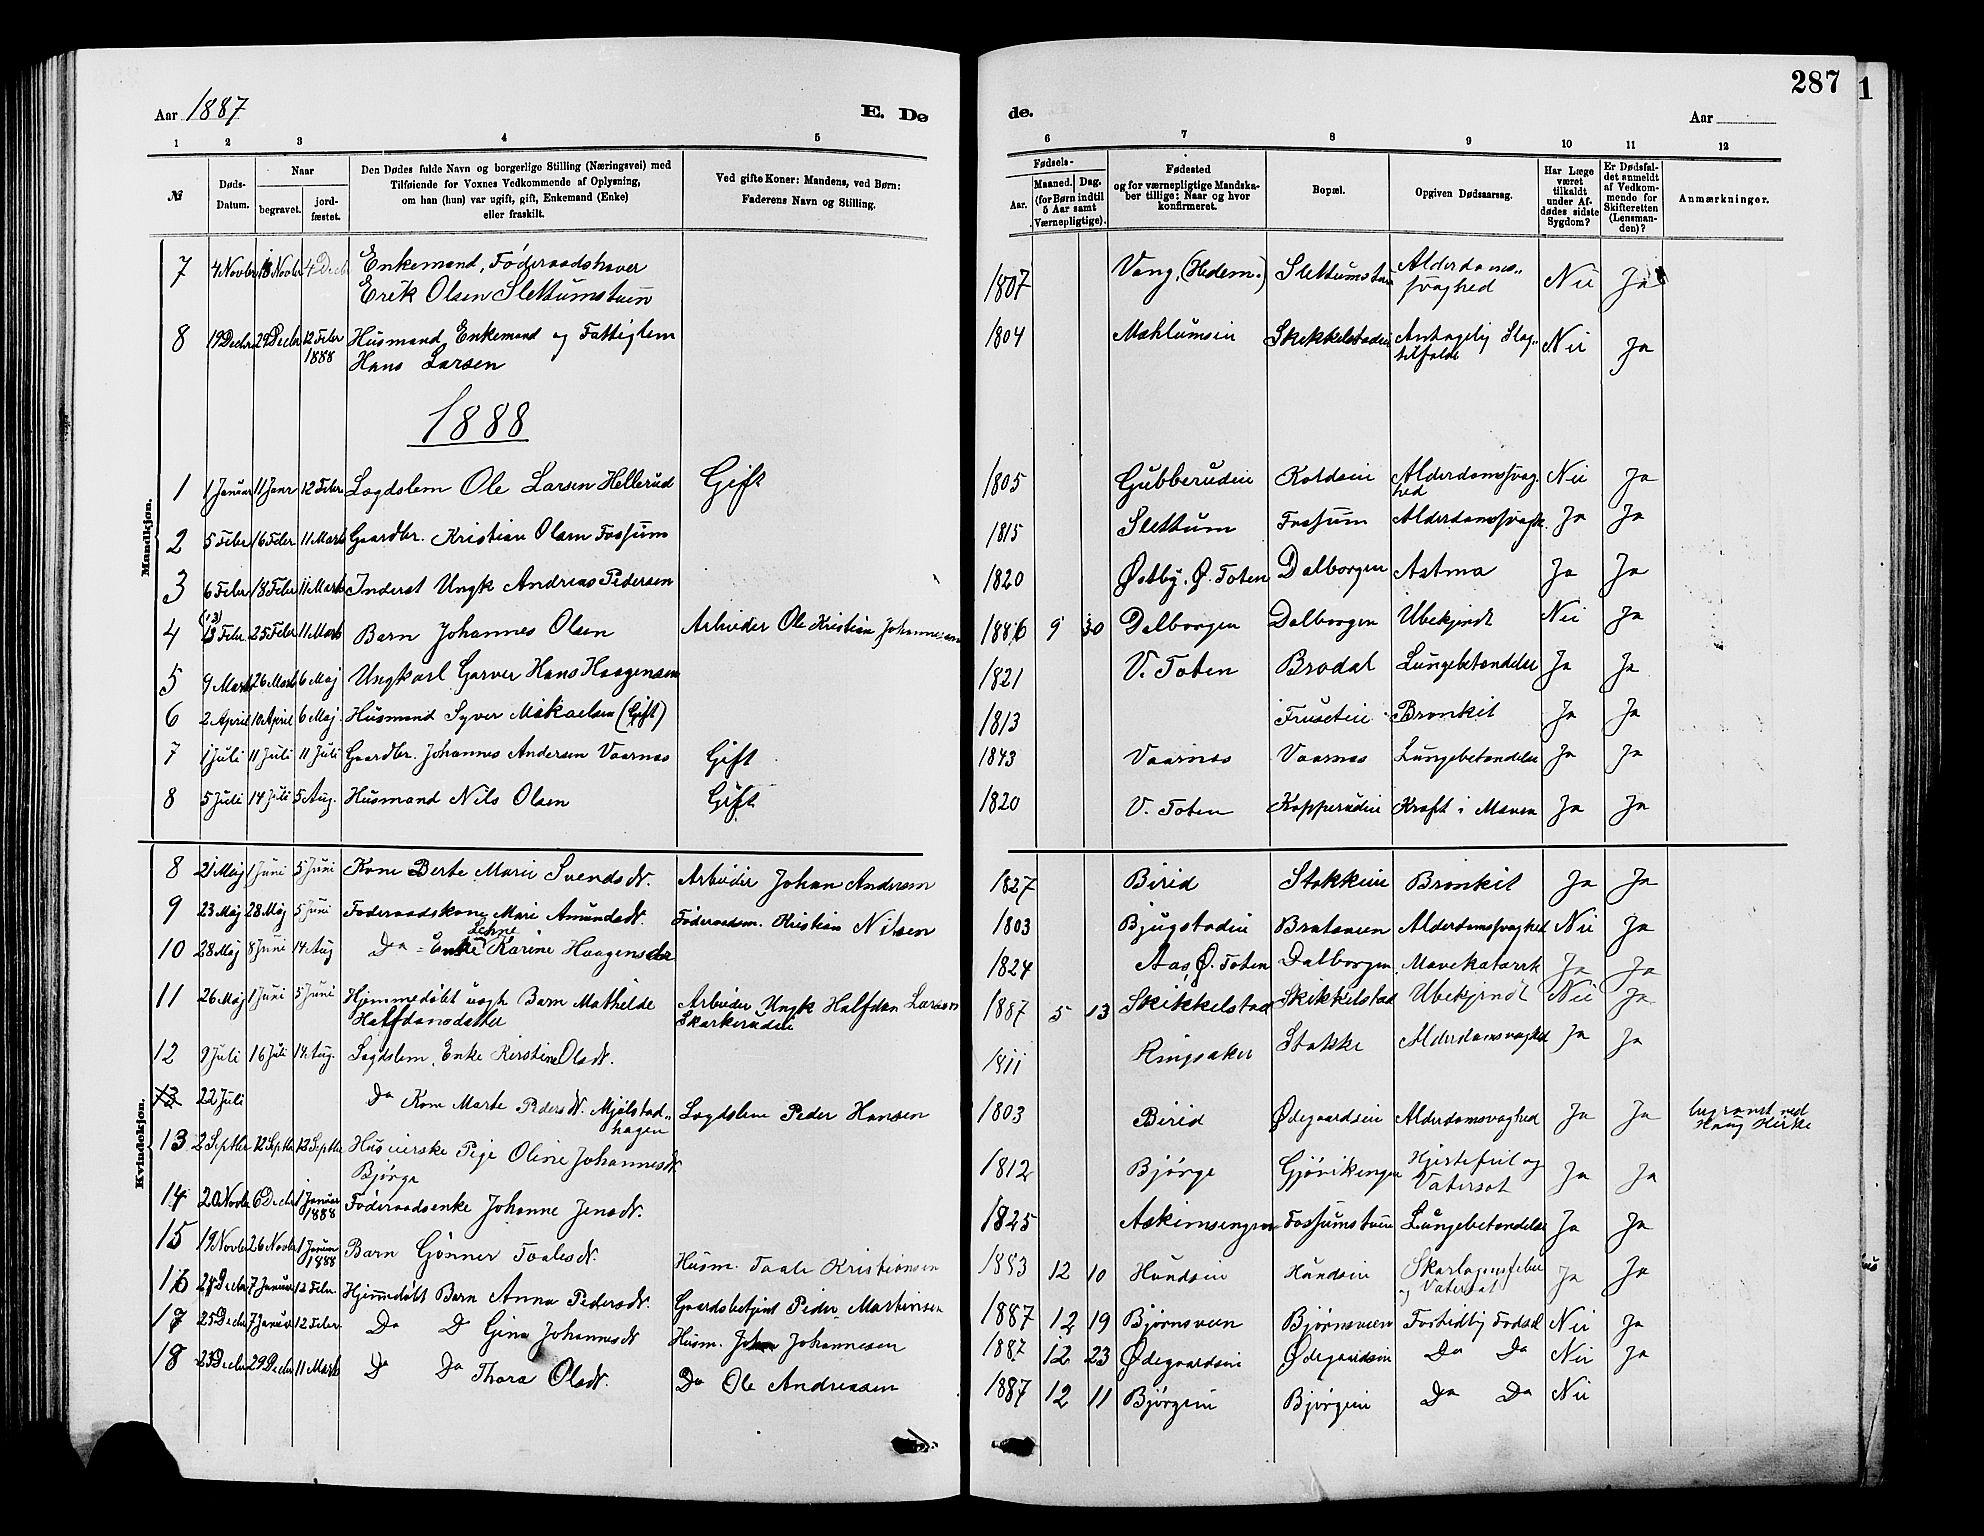 SAH, Vardal prestekontor, H/Ha/Hab/L0007: Klokkerbok nr. 7 /1, 1881-1895, s. 287